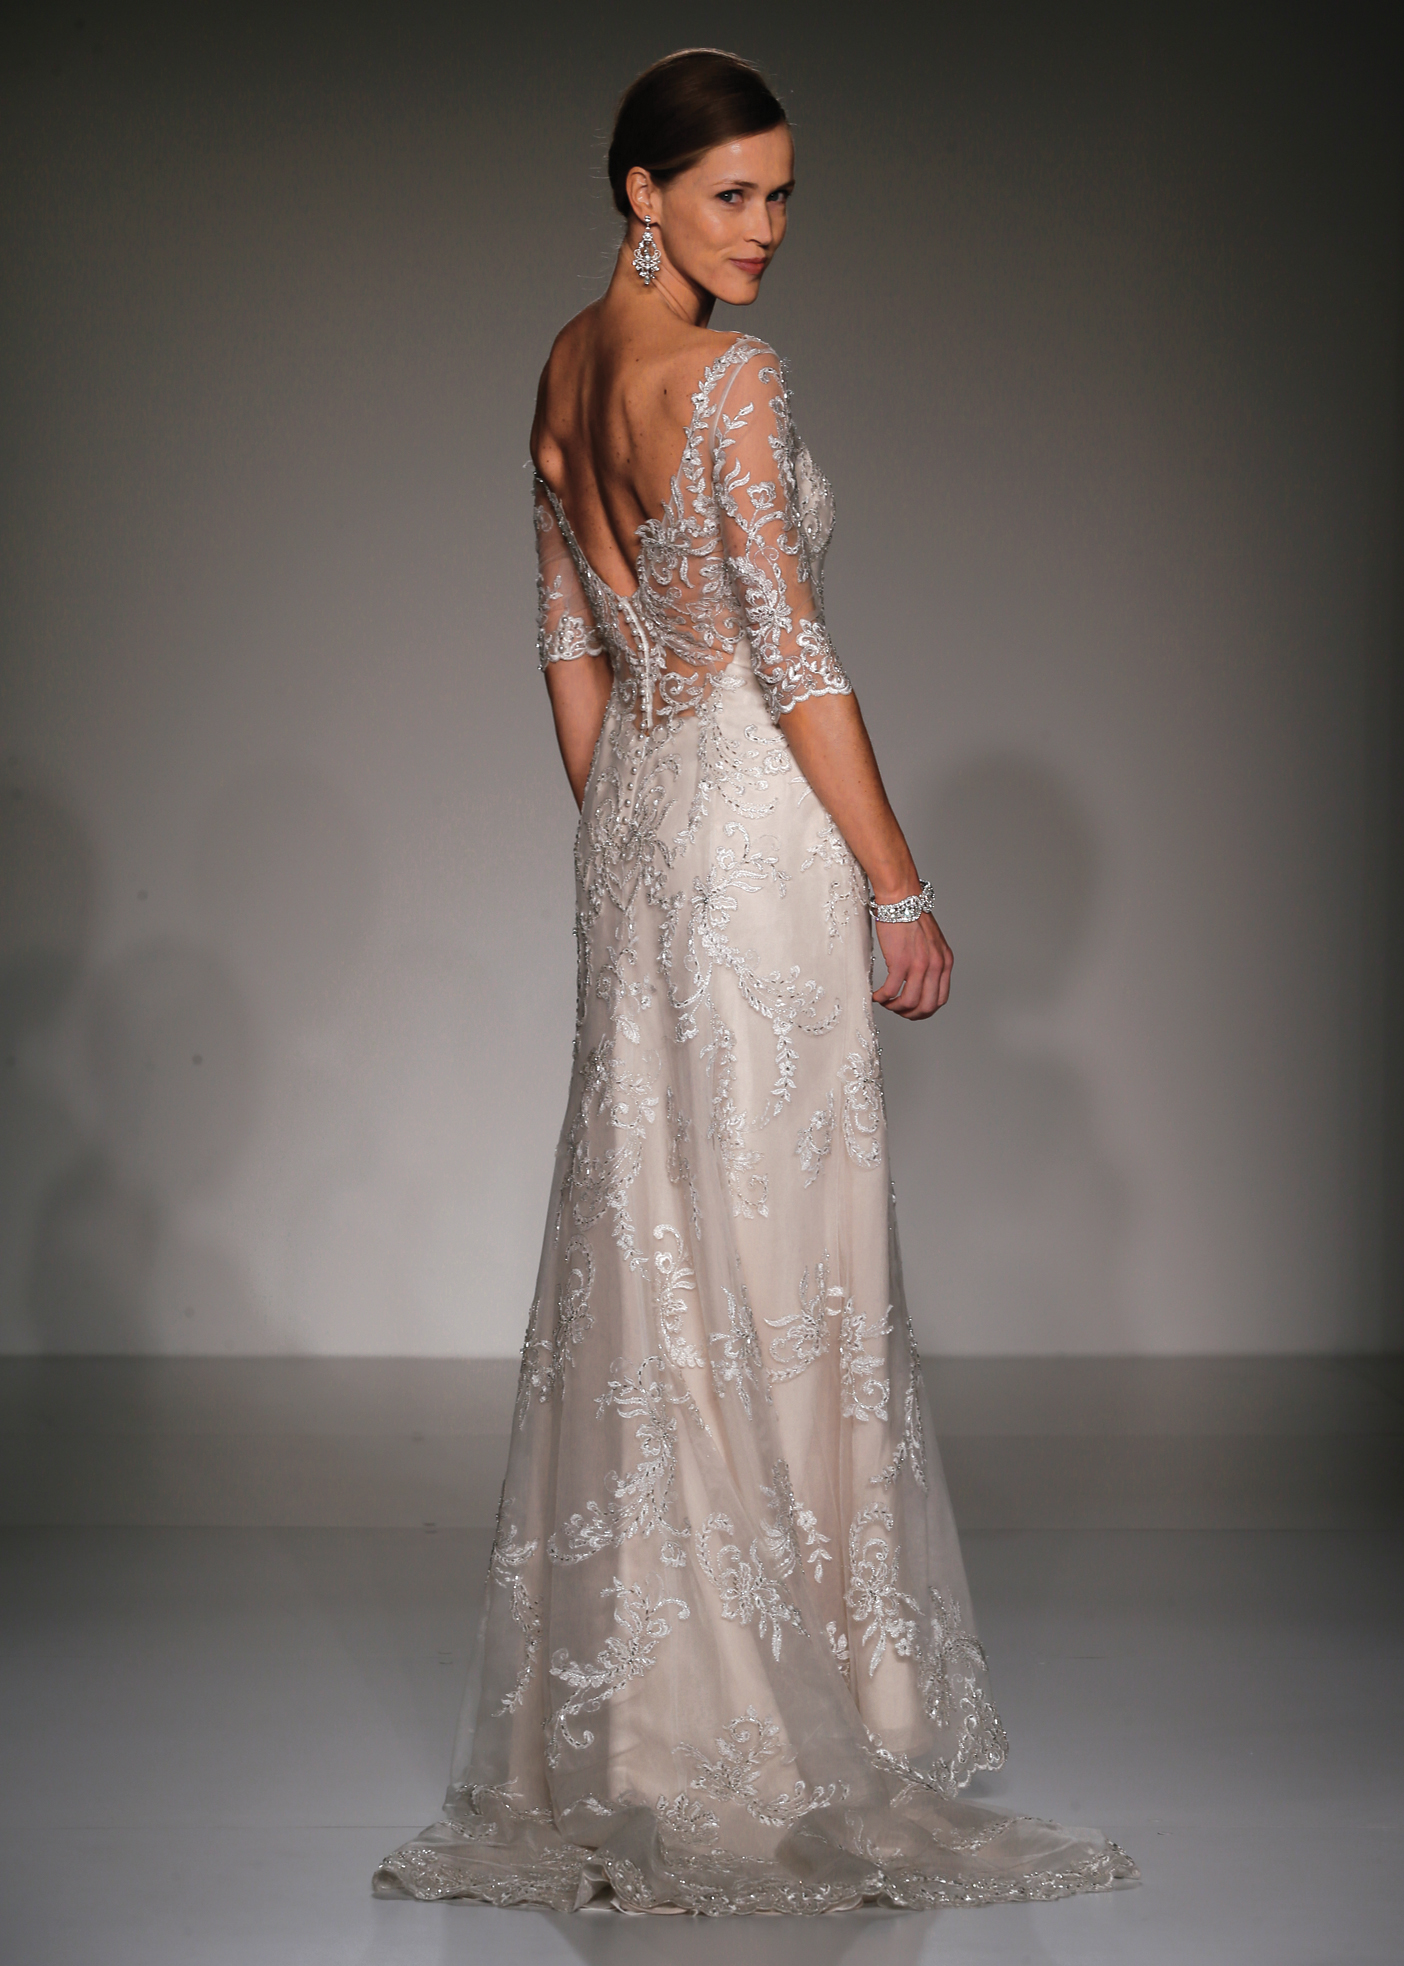 Maggie Sottero Glamorous 3 4 Sleeve Sheath Wedding Gown